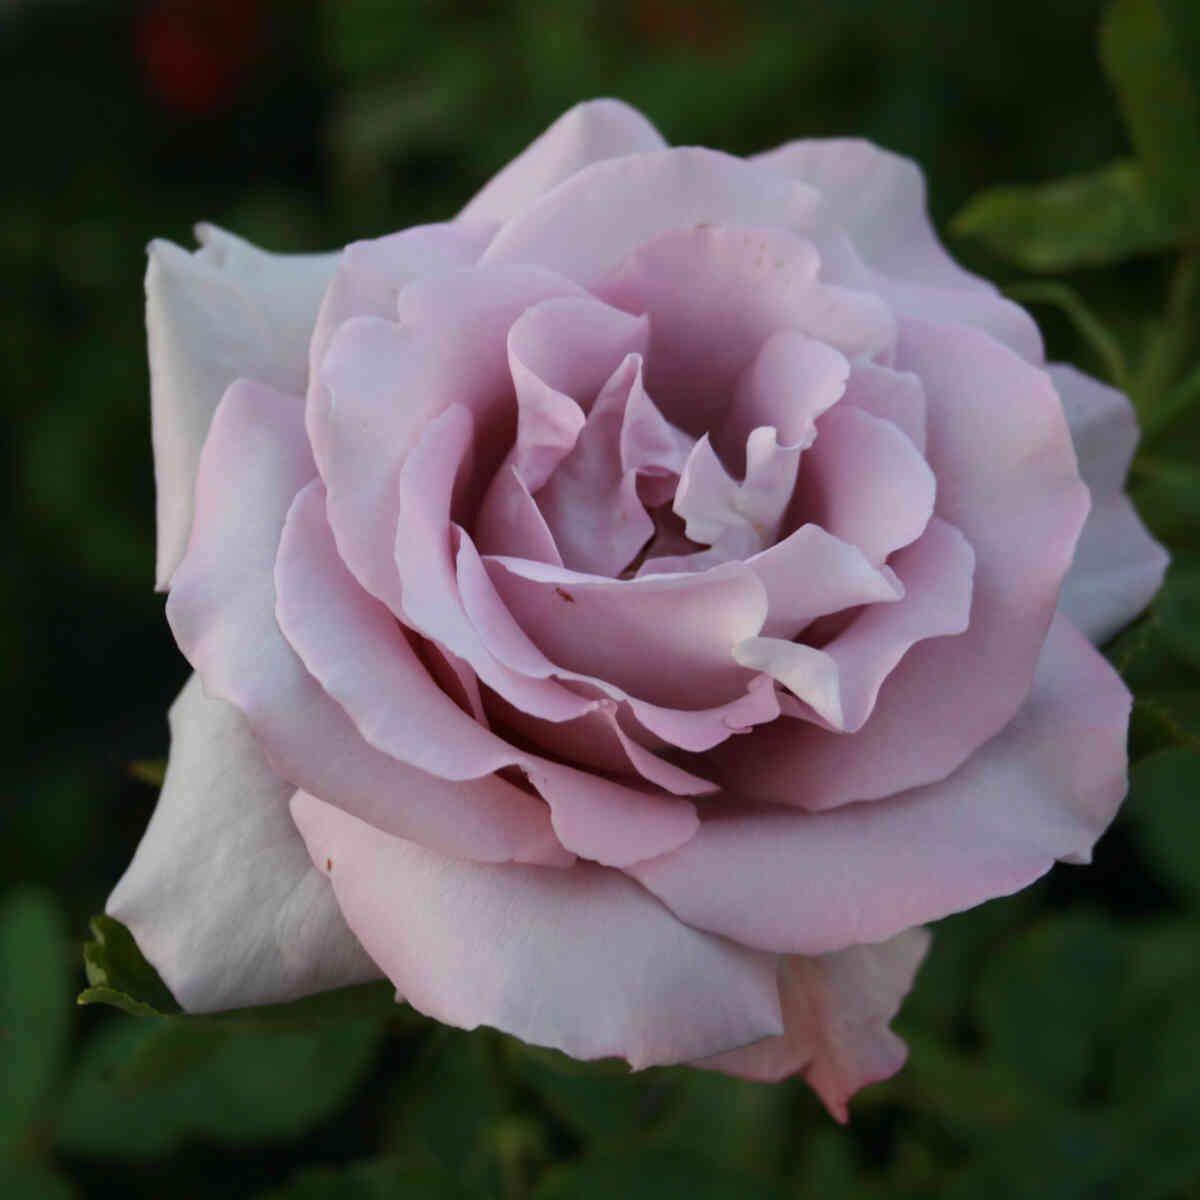 Rose 'Sprogø'